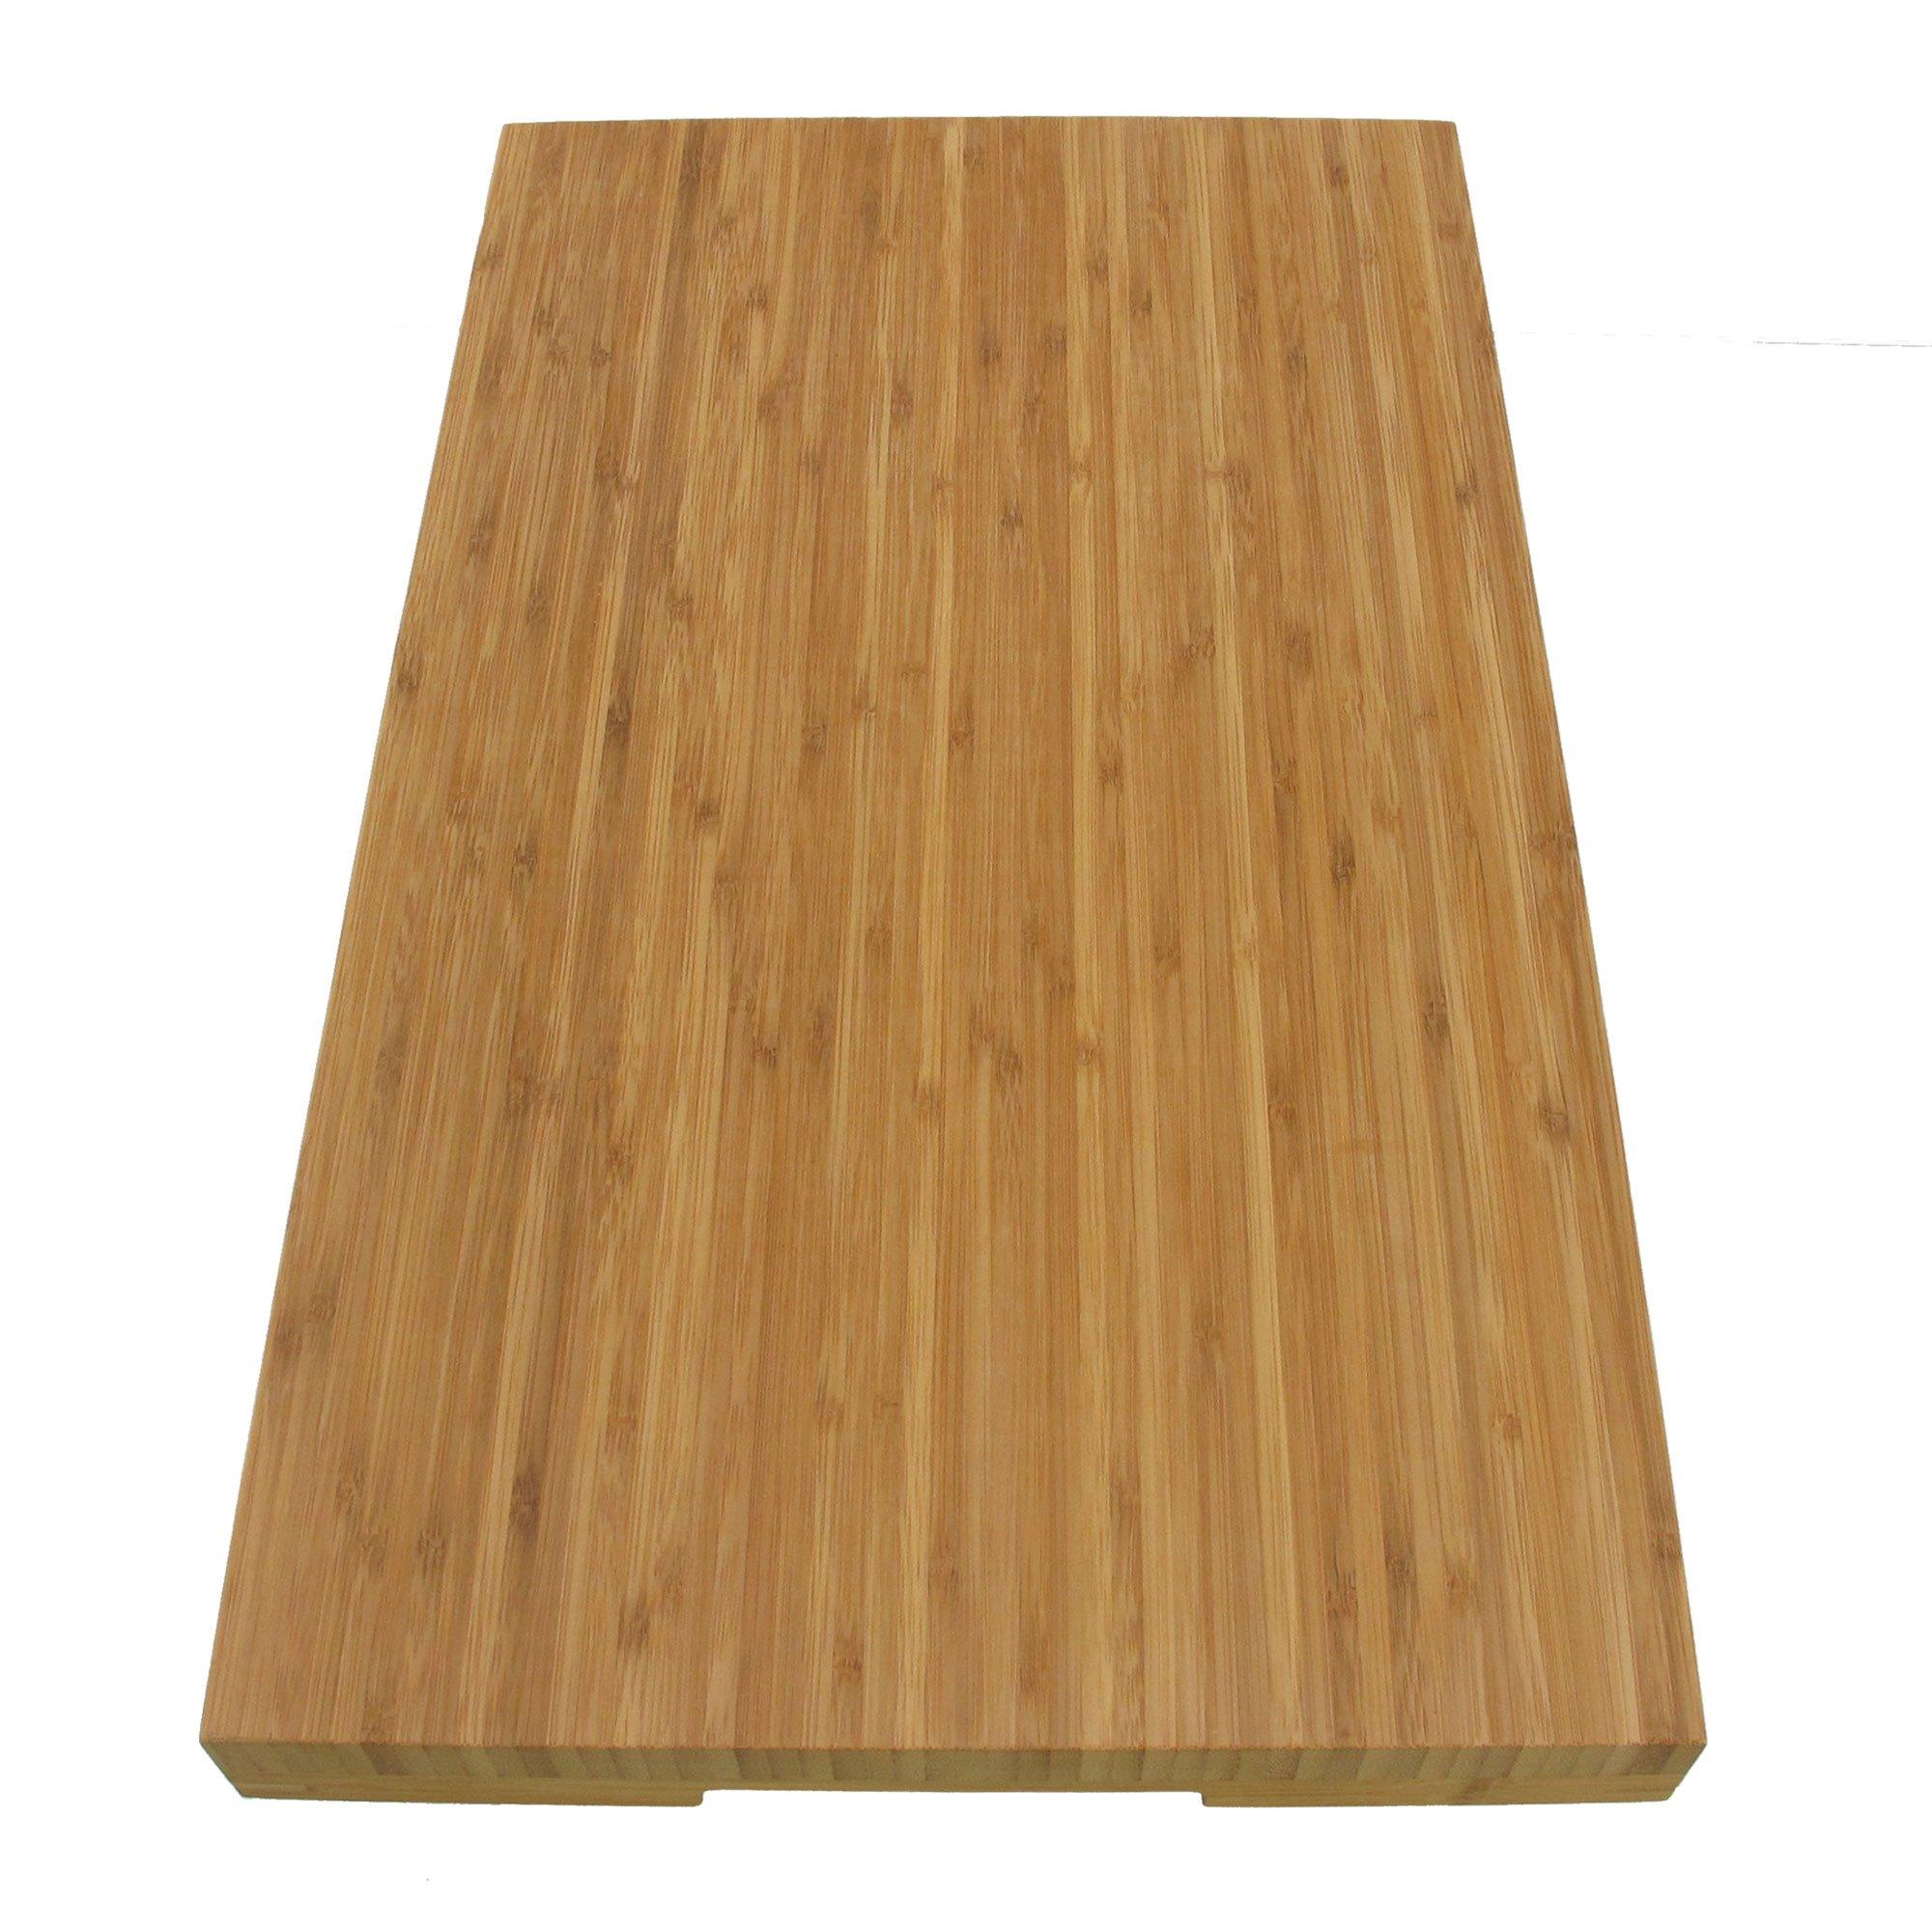 BambooMN Brand Jenn Air Bamboo Range Burner Cover / Cutting Board, New Vertical Cut, Large (20.5''x12''x1.57'') by BambooMN